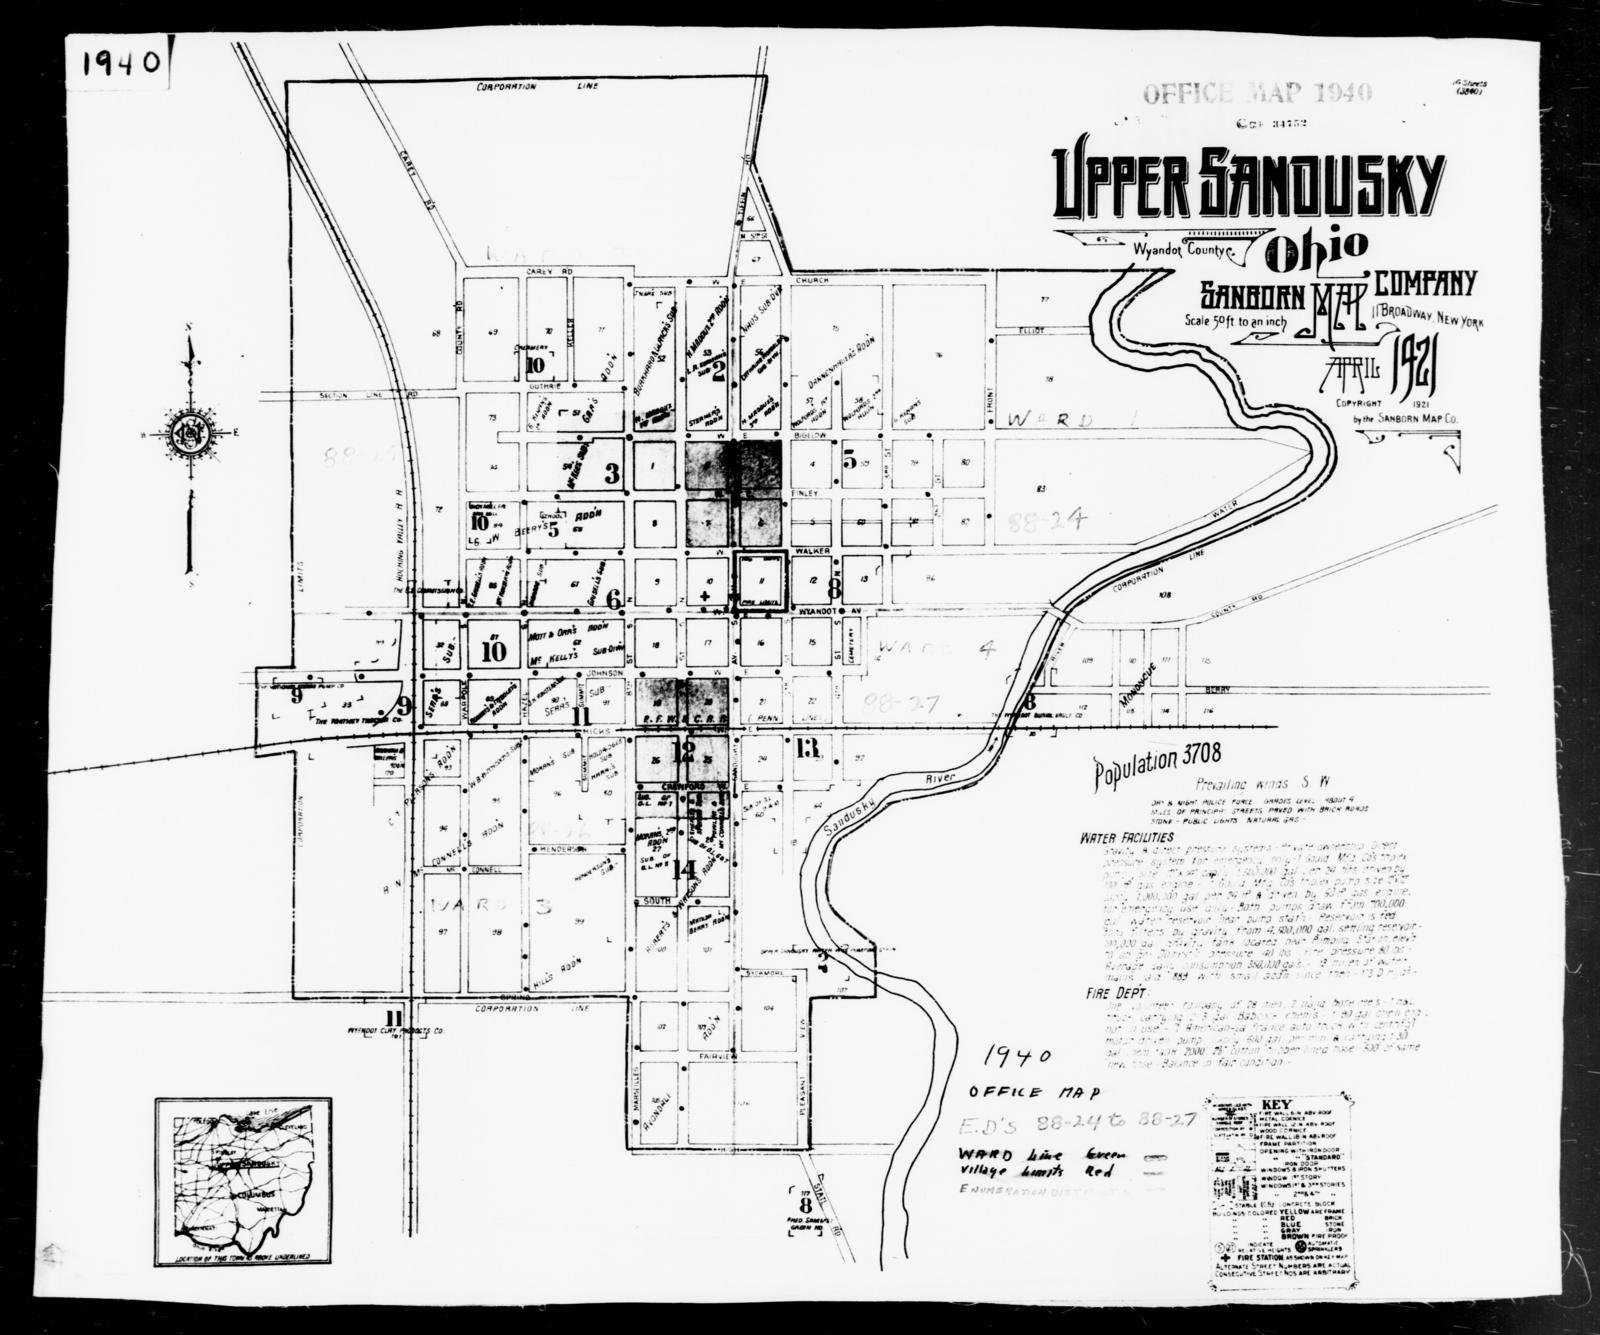 1940 Census Enumeration District Maps - Ohio - Wyandot County - Upper Sandusky - ED 88-24, ED 88-25, ED 88-26, ED 88-27